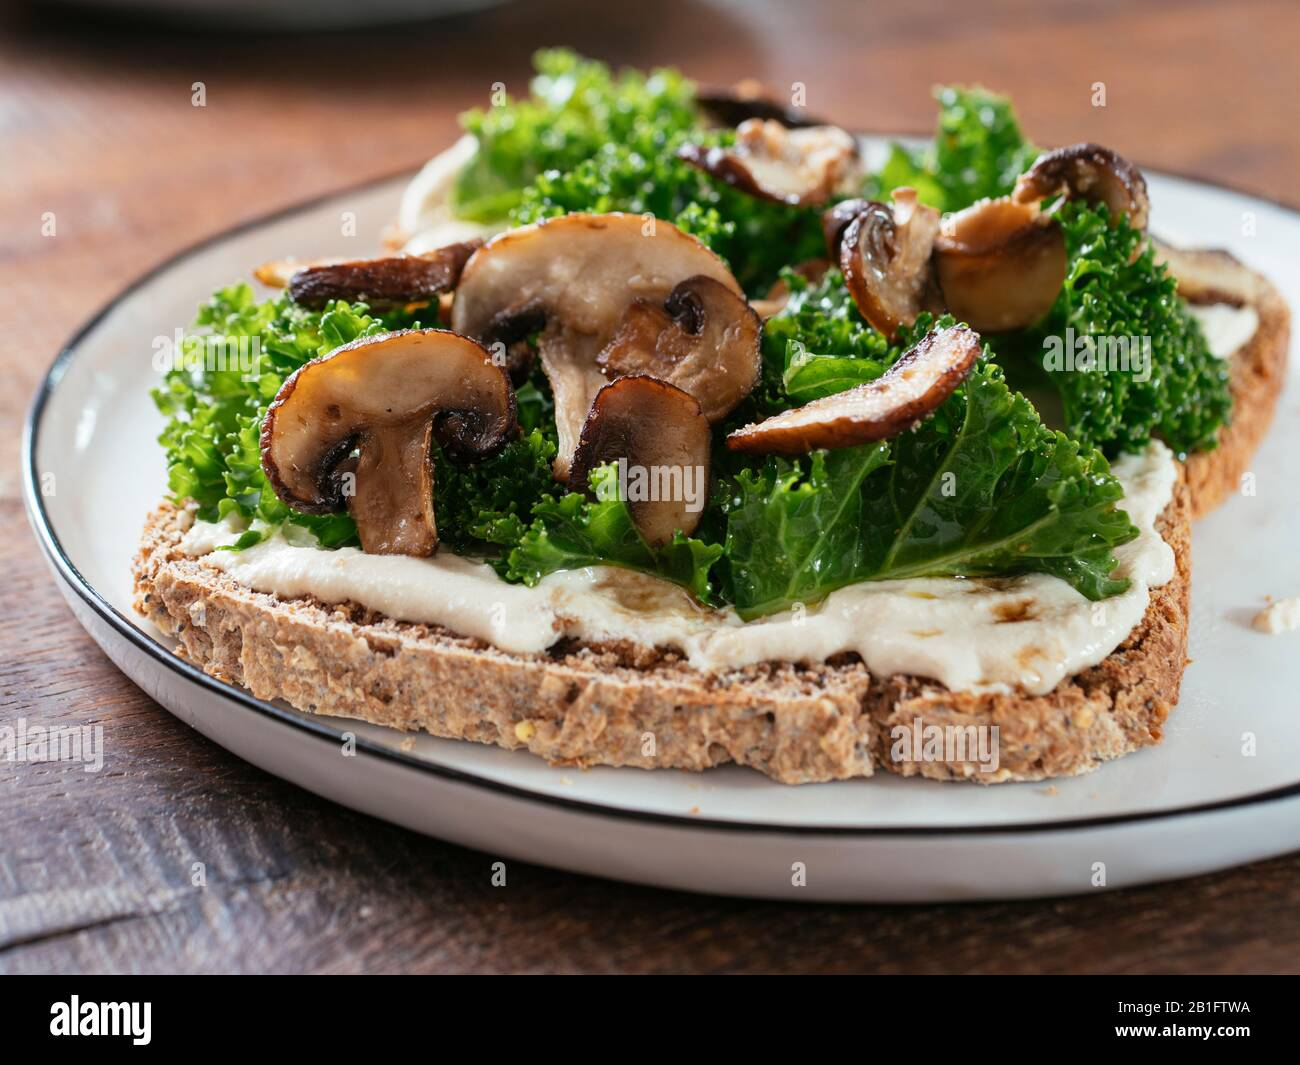 Mushrooms and Kale with Vegan Ricotta on Toast Stock Photo   Alamy